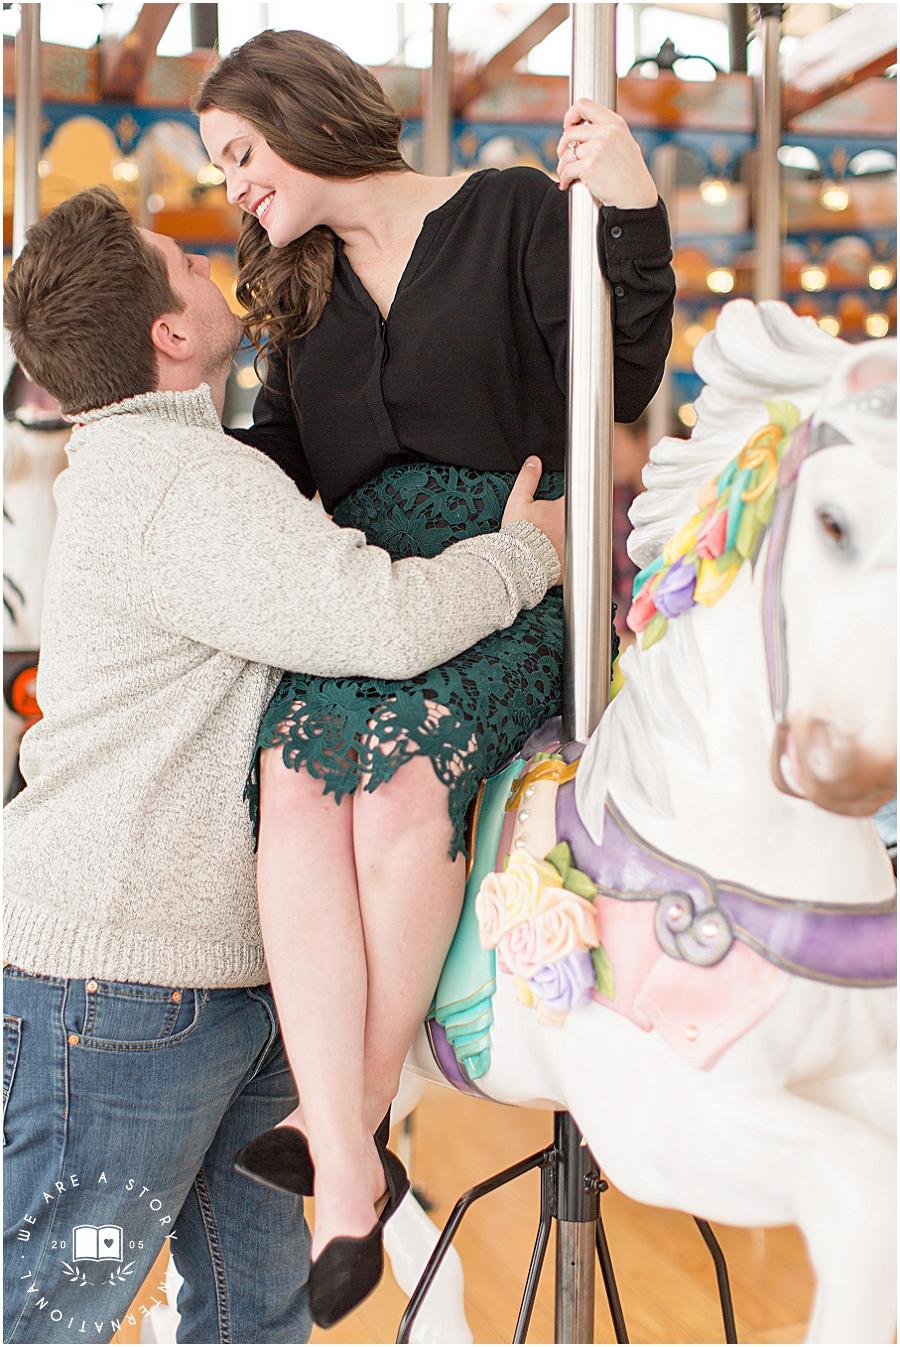 Cincinnati Wedding Photographer_We Are A Story_Molly & Matt Engagement Session_2530.jpg